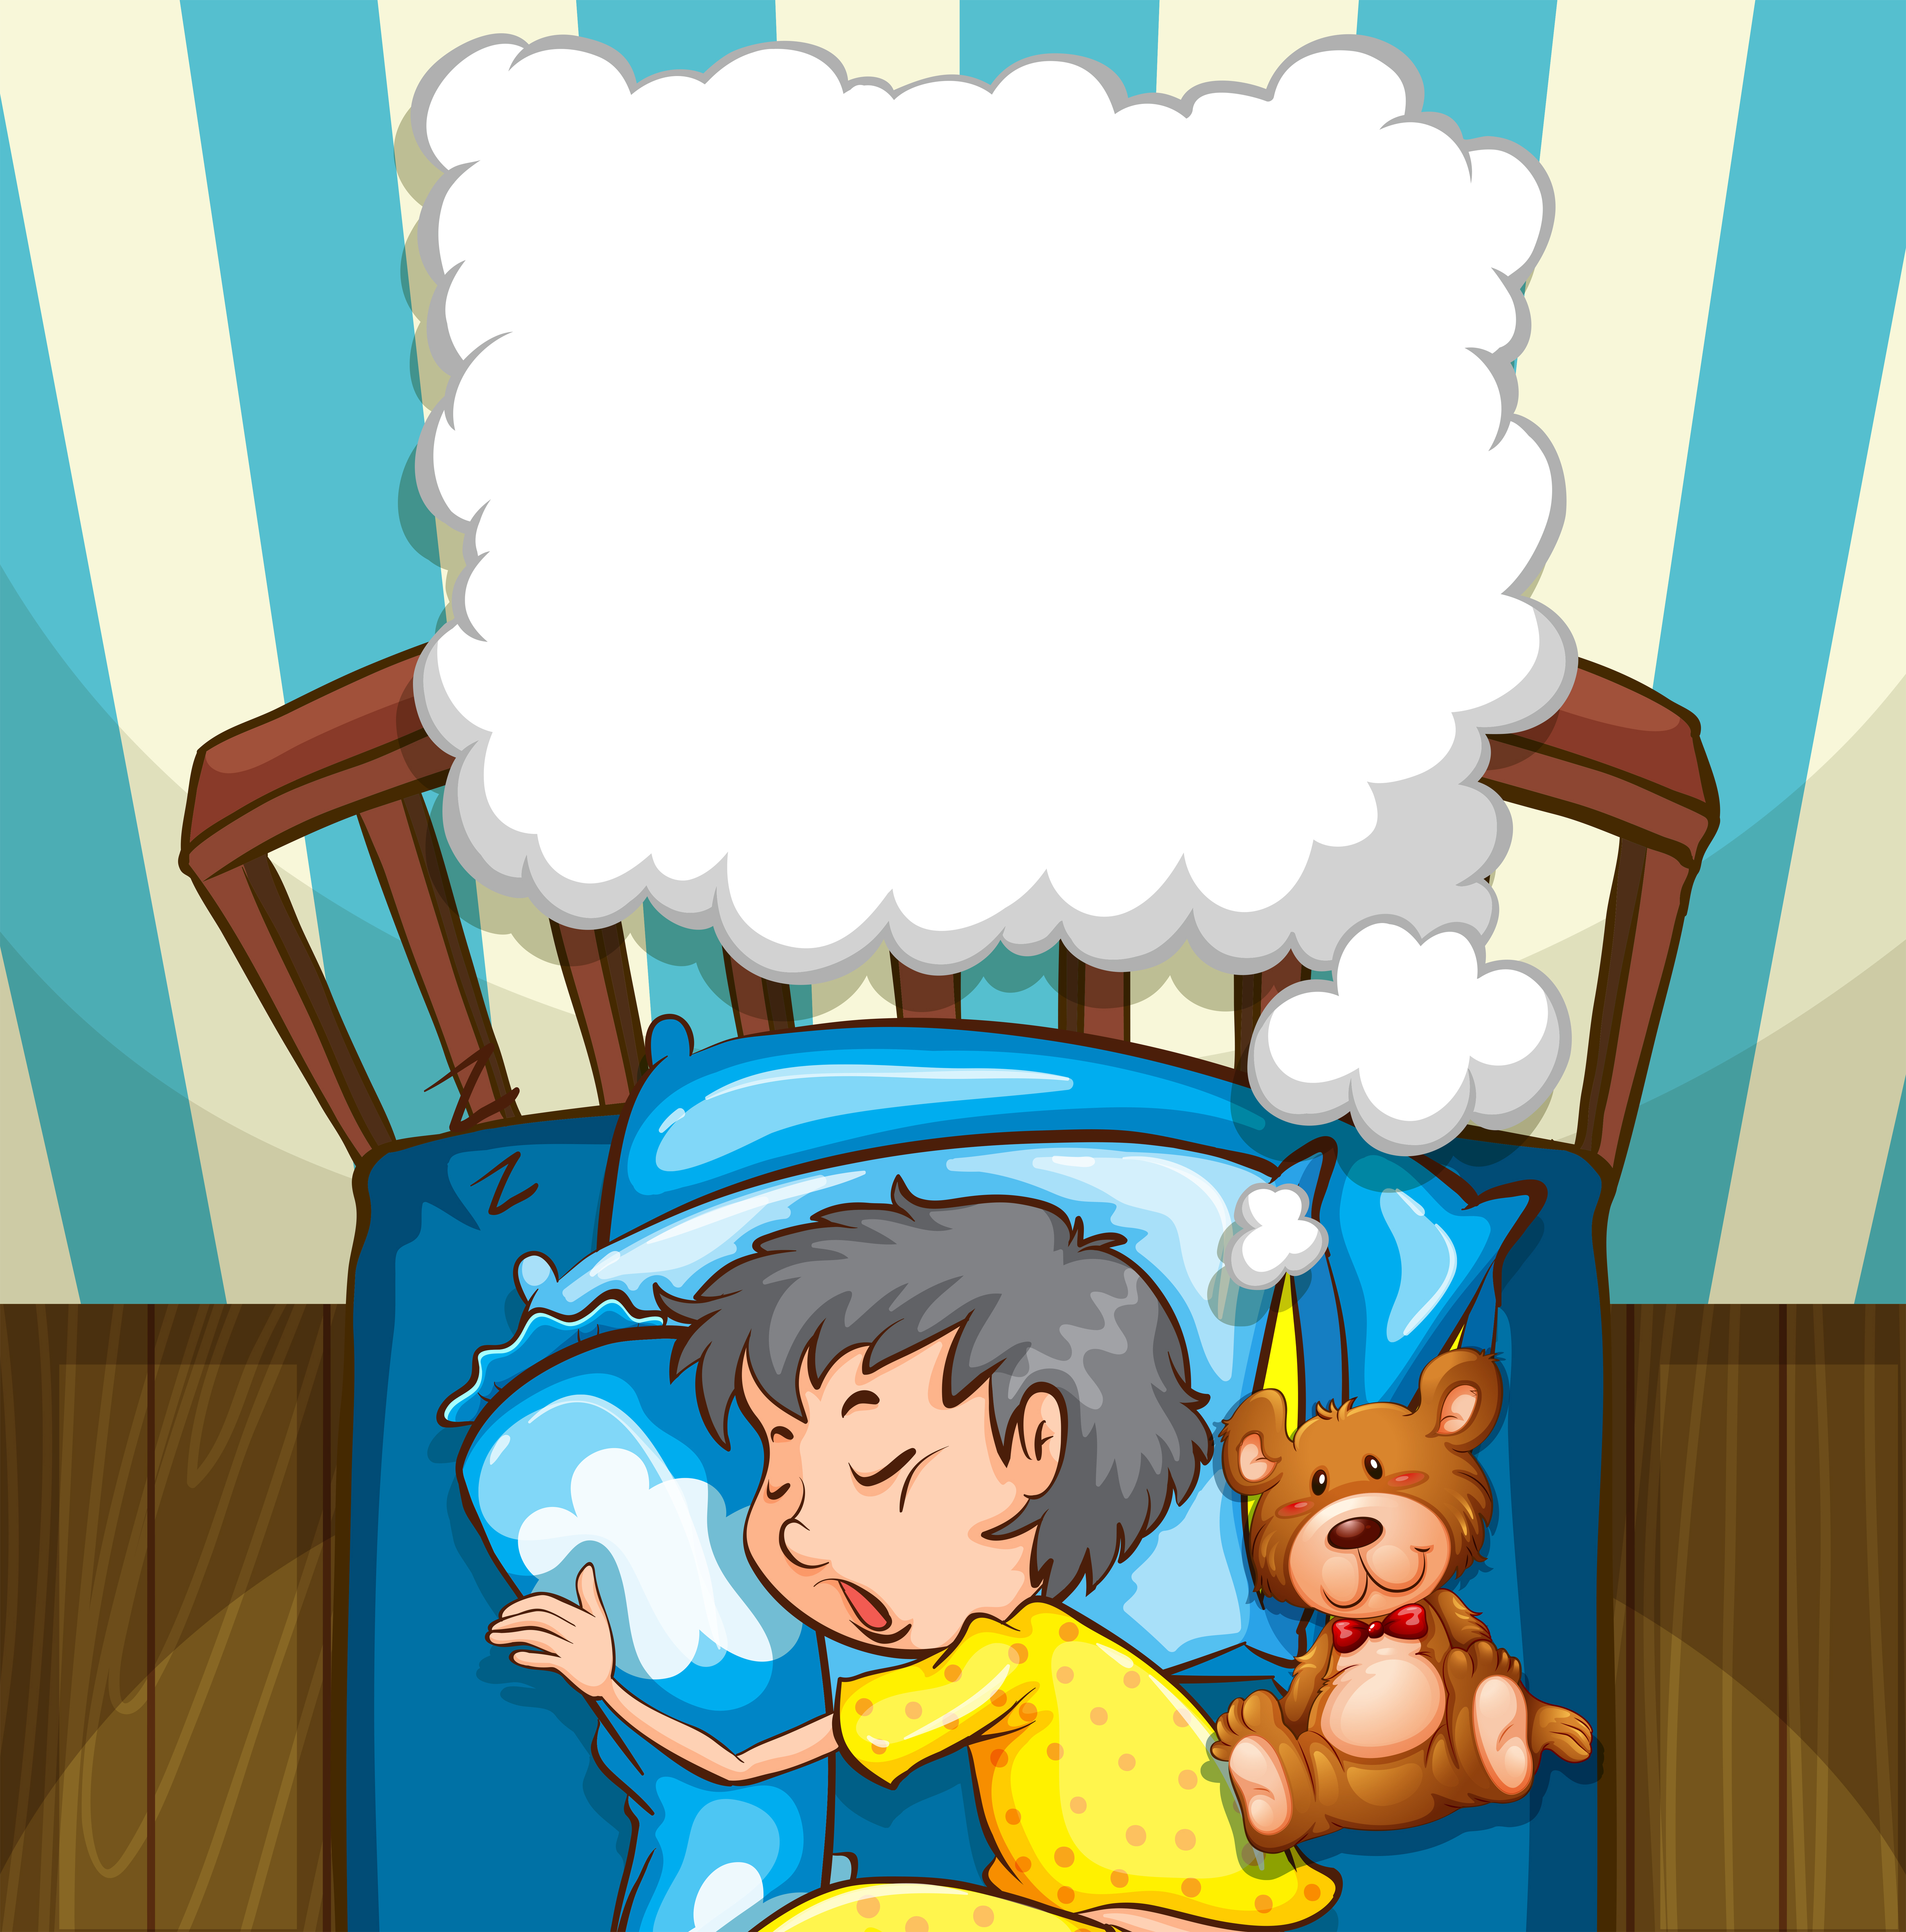 Little boy in yellow pajamas sleeping - Download Free